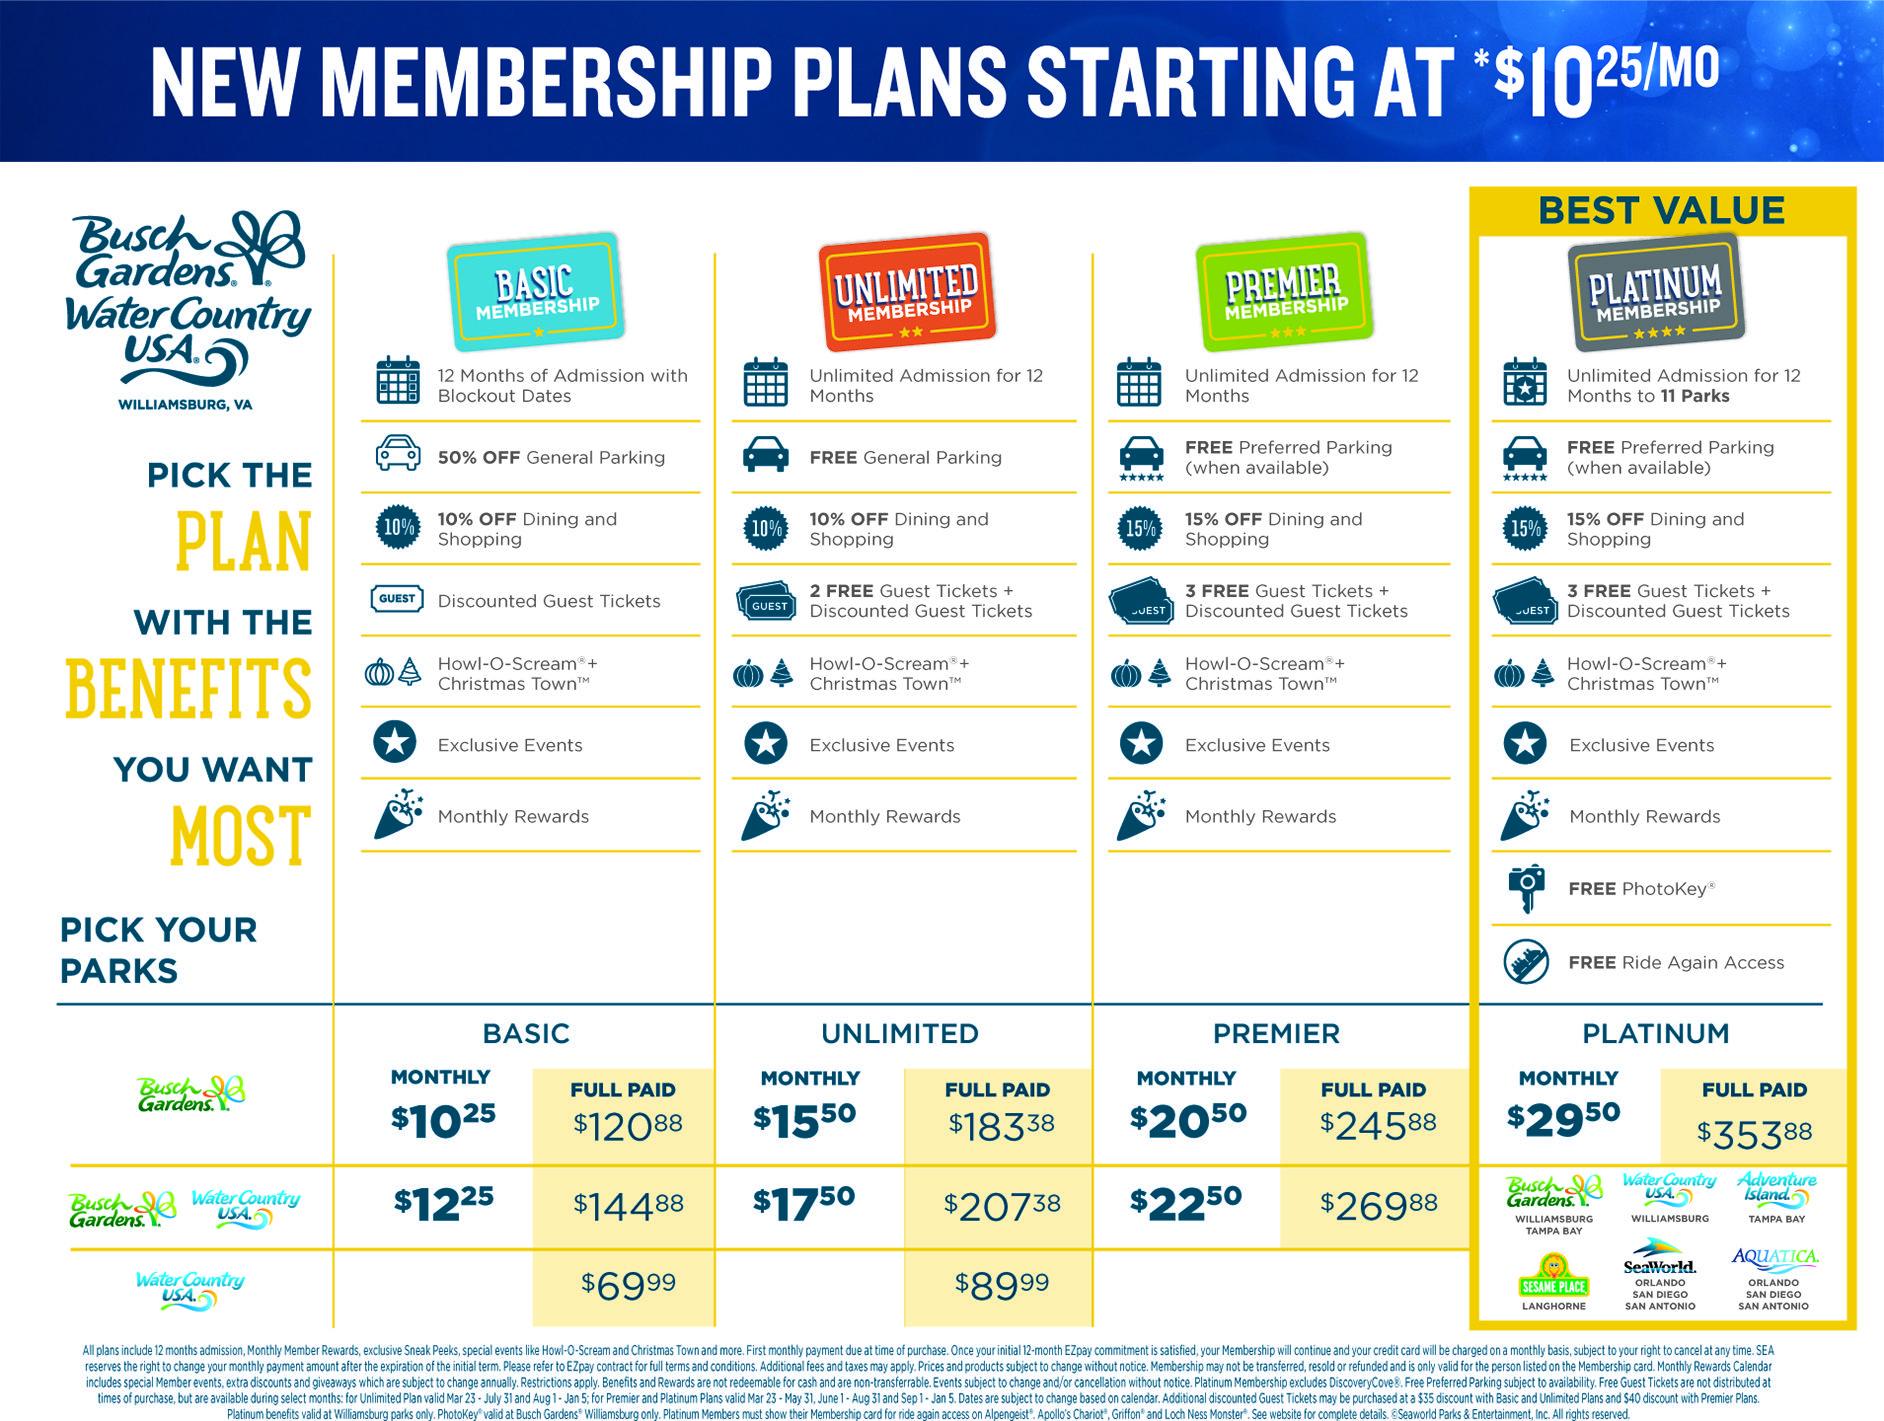 f17a2c0f53283350a639f7896f8846ac - Busch Gardens Williamsburg Season Pass Discount